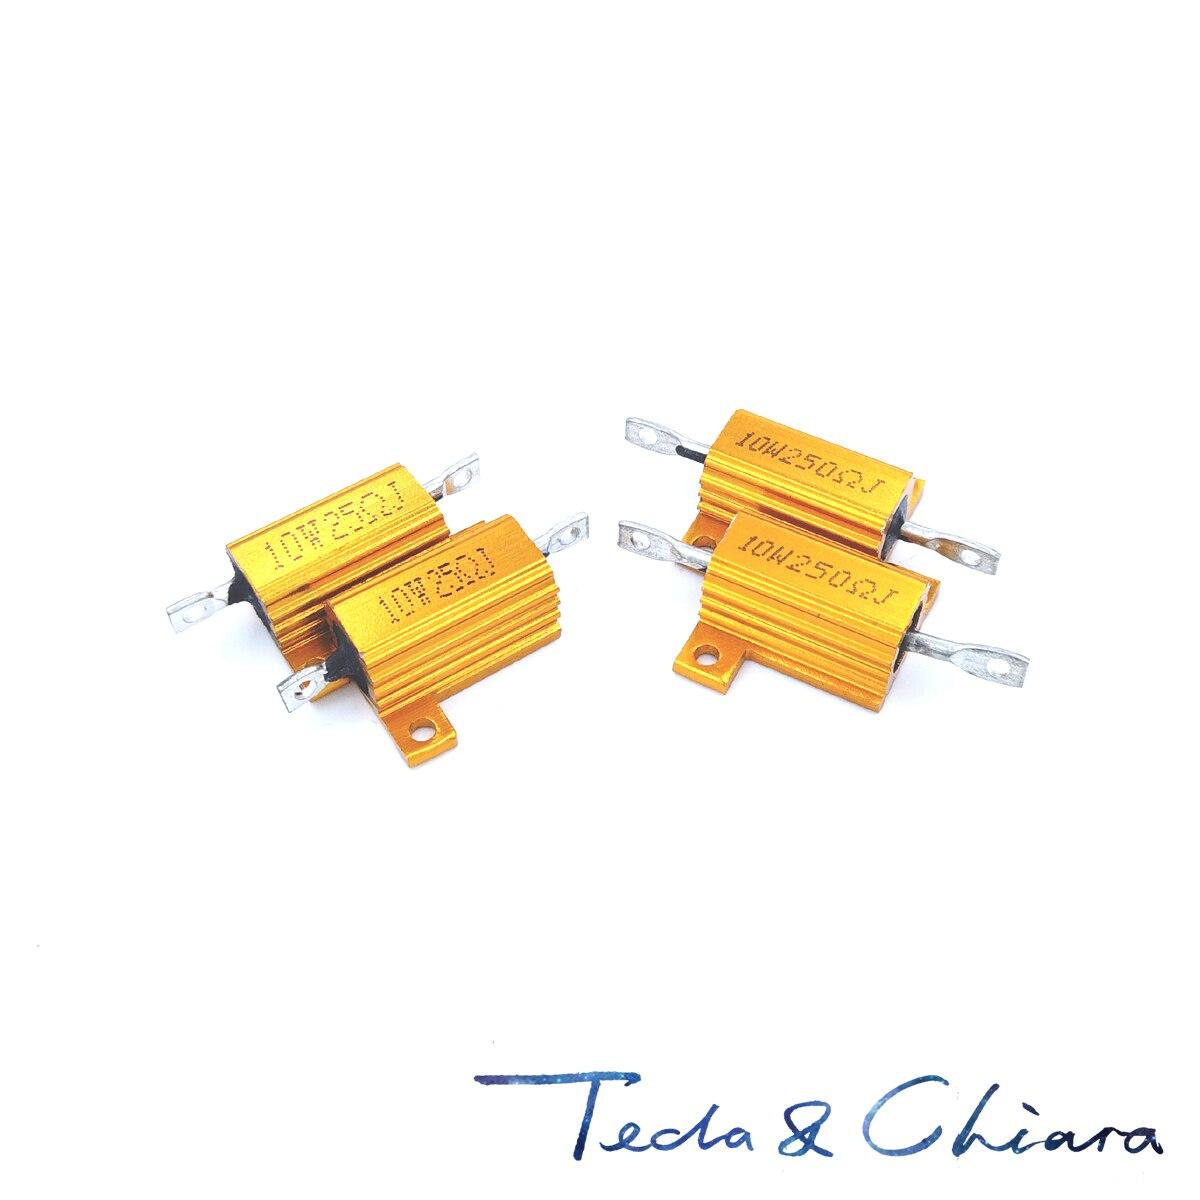 0.15R 0.15 0.15ohm 0.22R 0.22 0.22ohm R Ohm 10W Gold Tone Wirewound Aluminum Power Metal Shell Case Resistance Resistor RX24